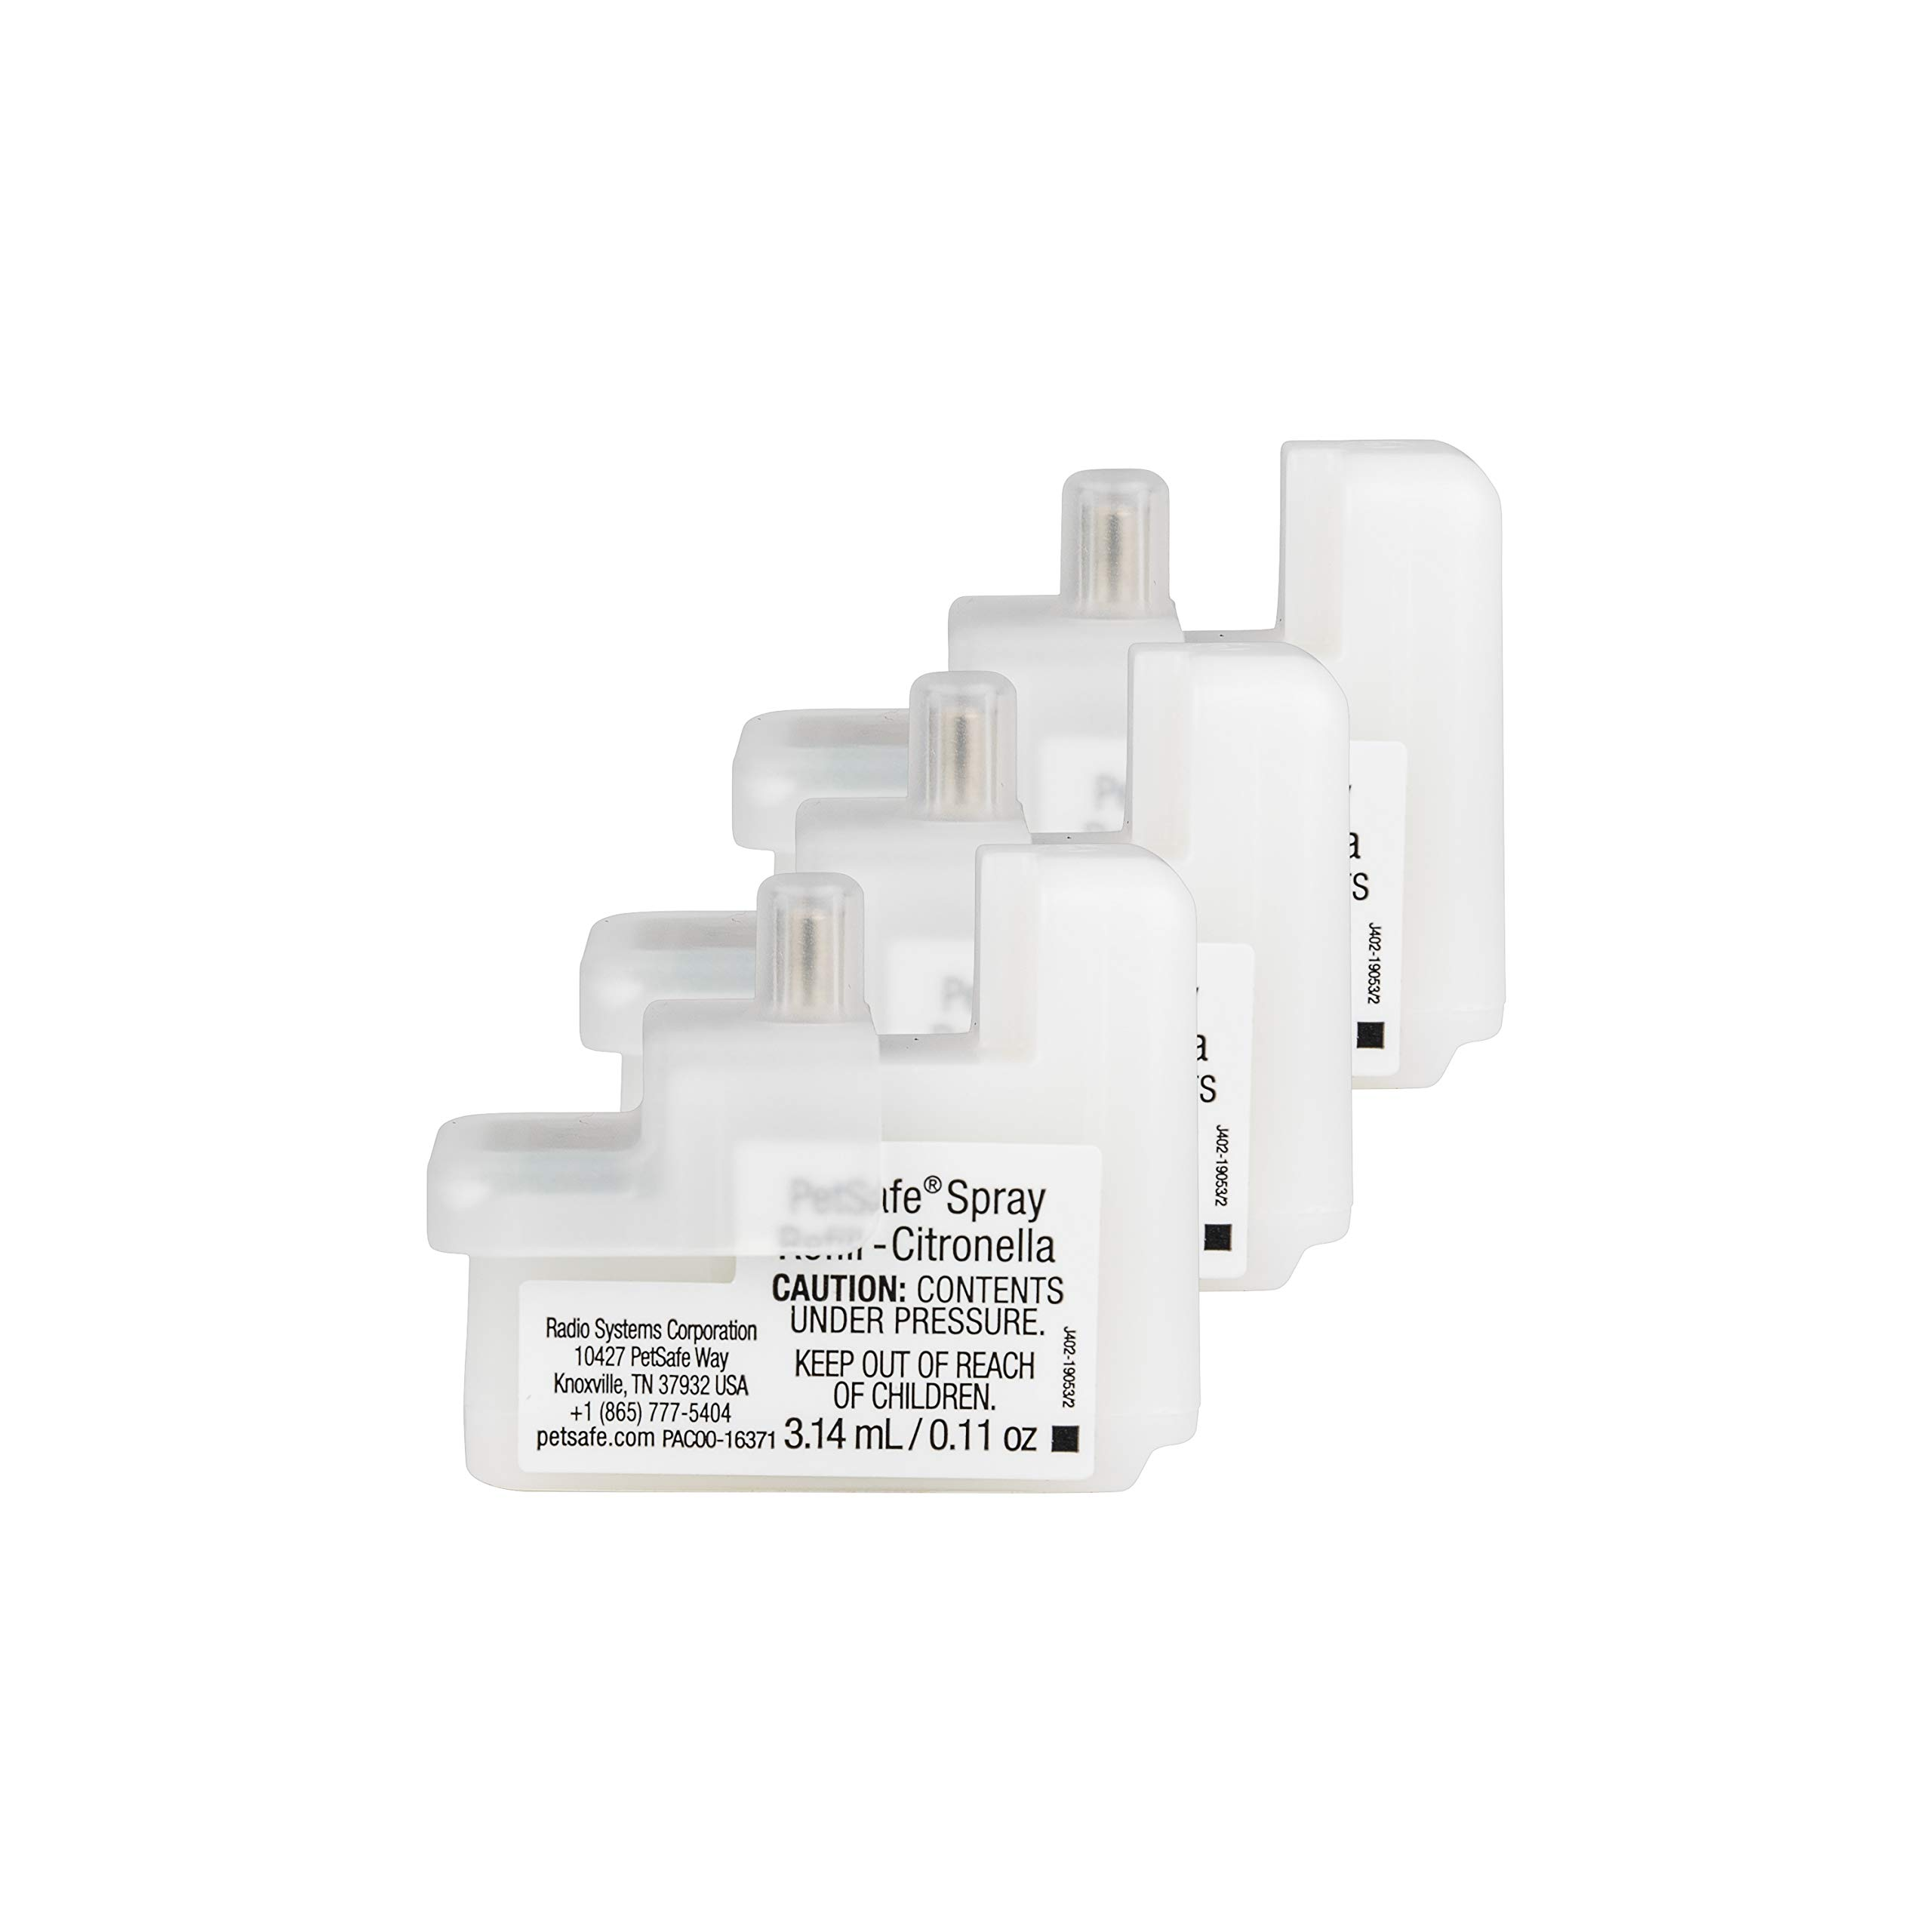 PetSafe Spray Bark Citronella Refill, Replacement Cartridges Spray Bark Collar, Refill Cartridge Only, Collar Not Included, 3-Pack